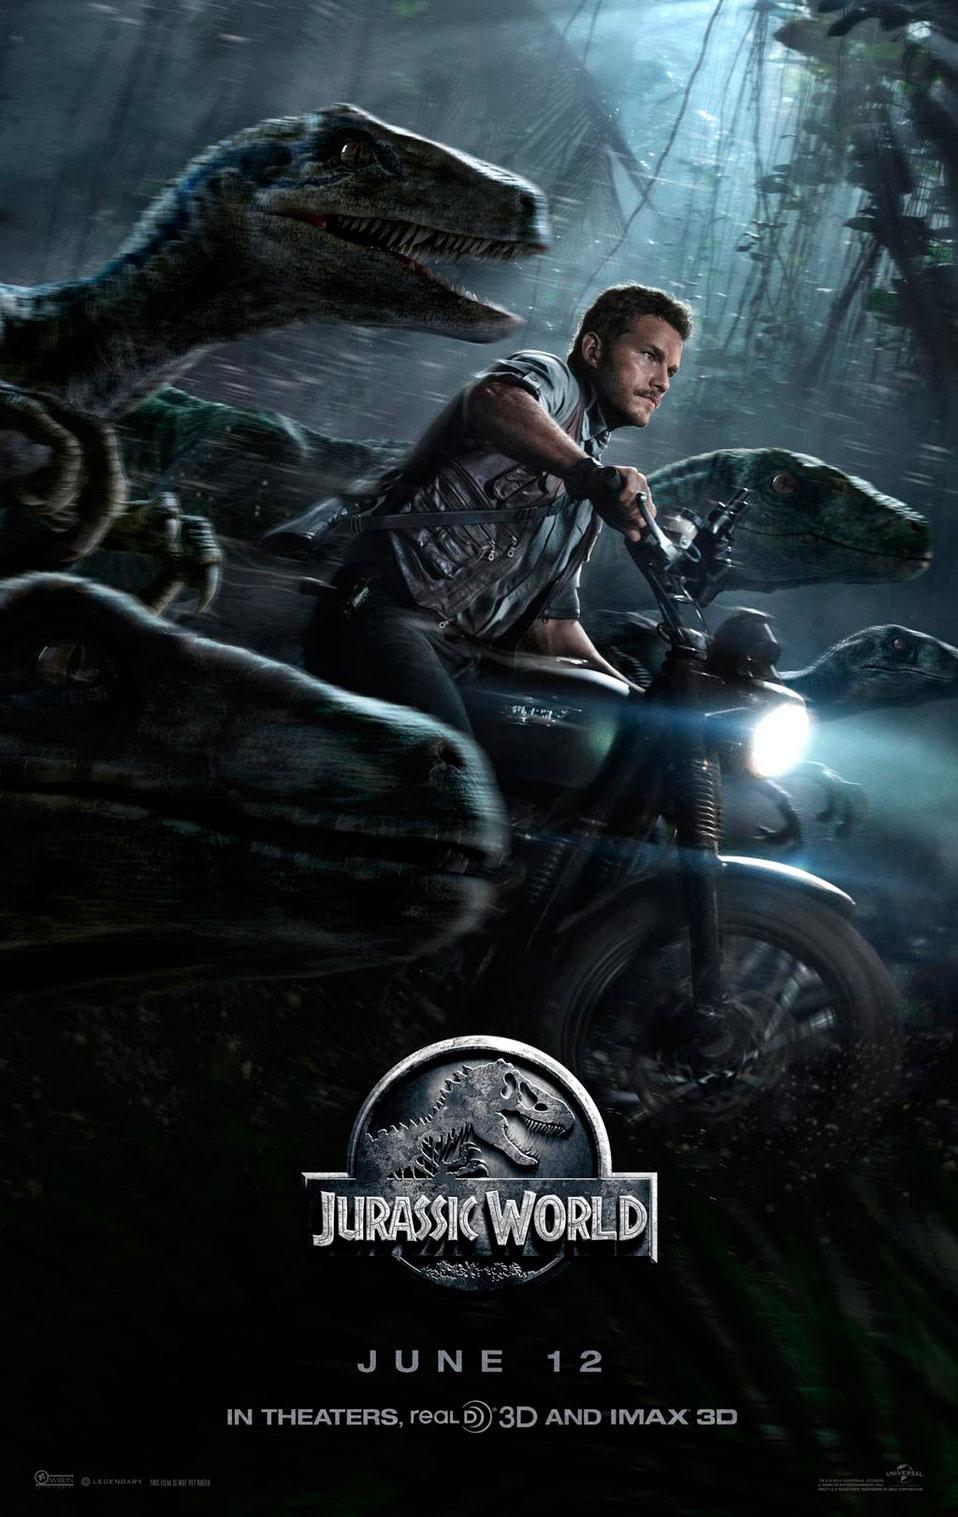 jurassic_world_poster2